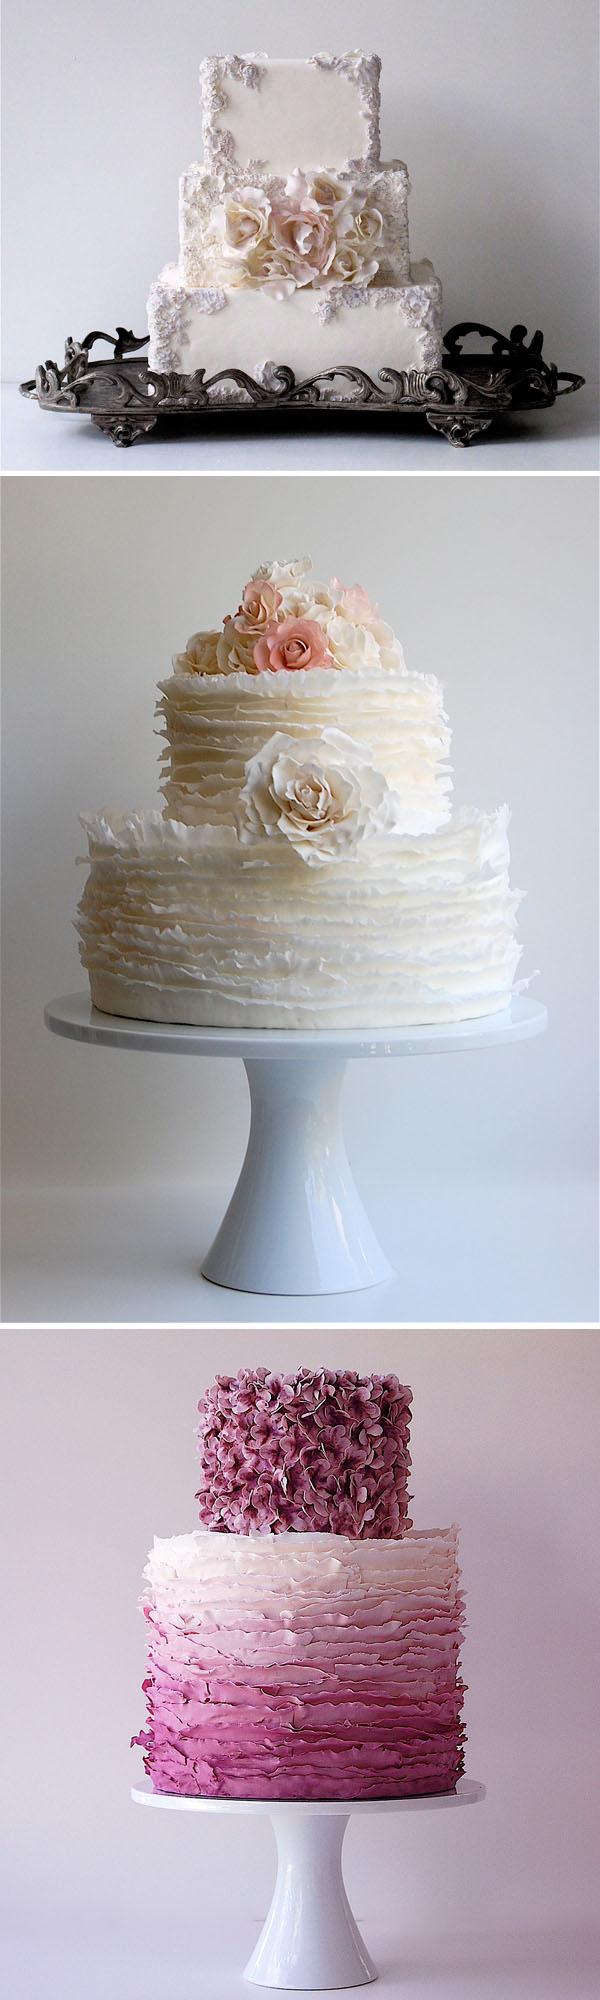 maggie austin wedding cakes todo casamento. Black Bedroom Furniture Sets. Home Design Ideas